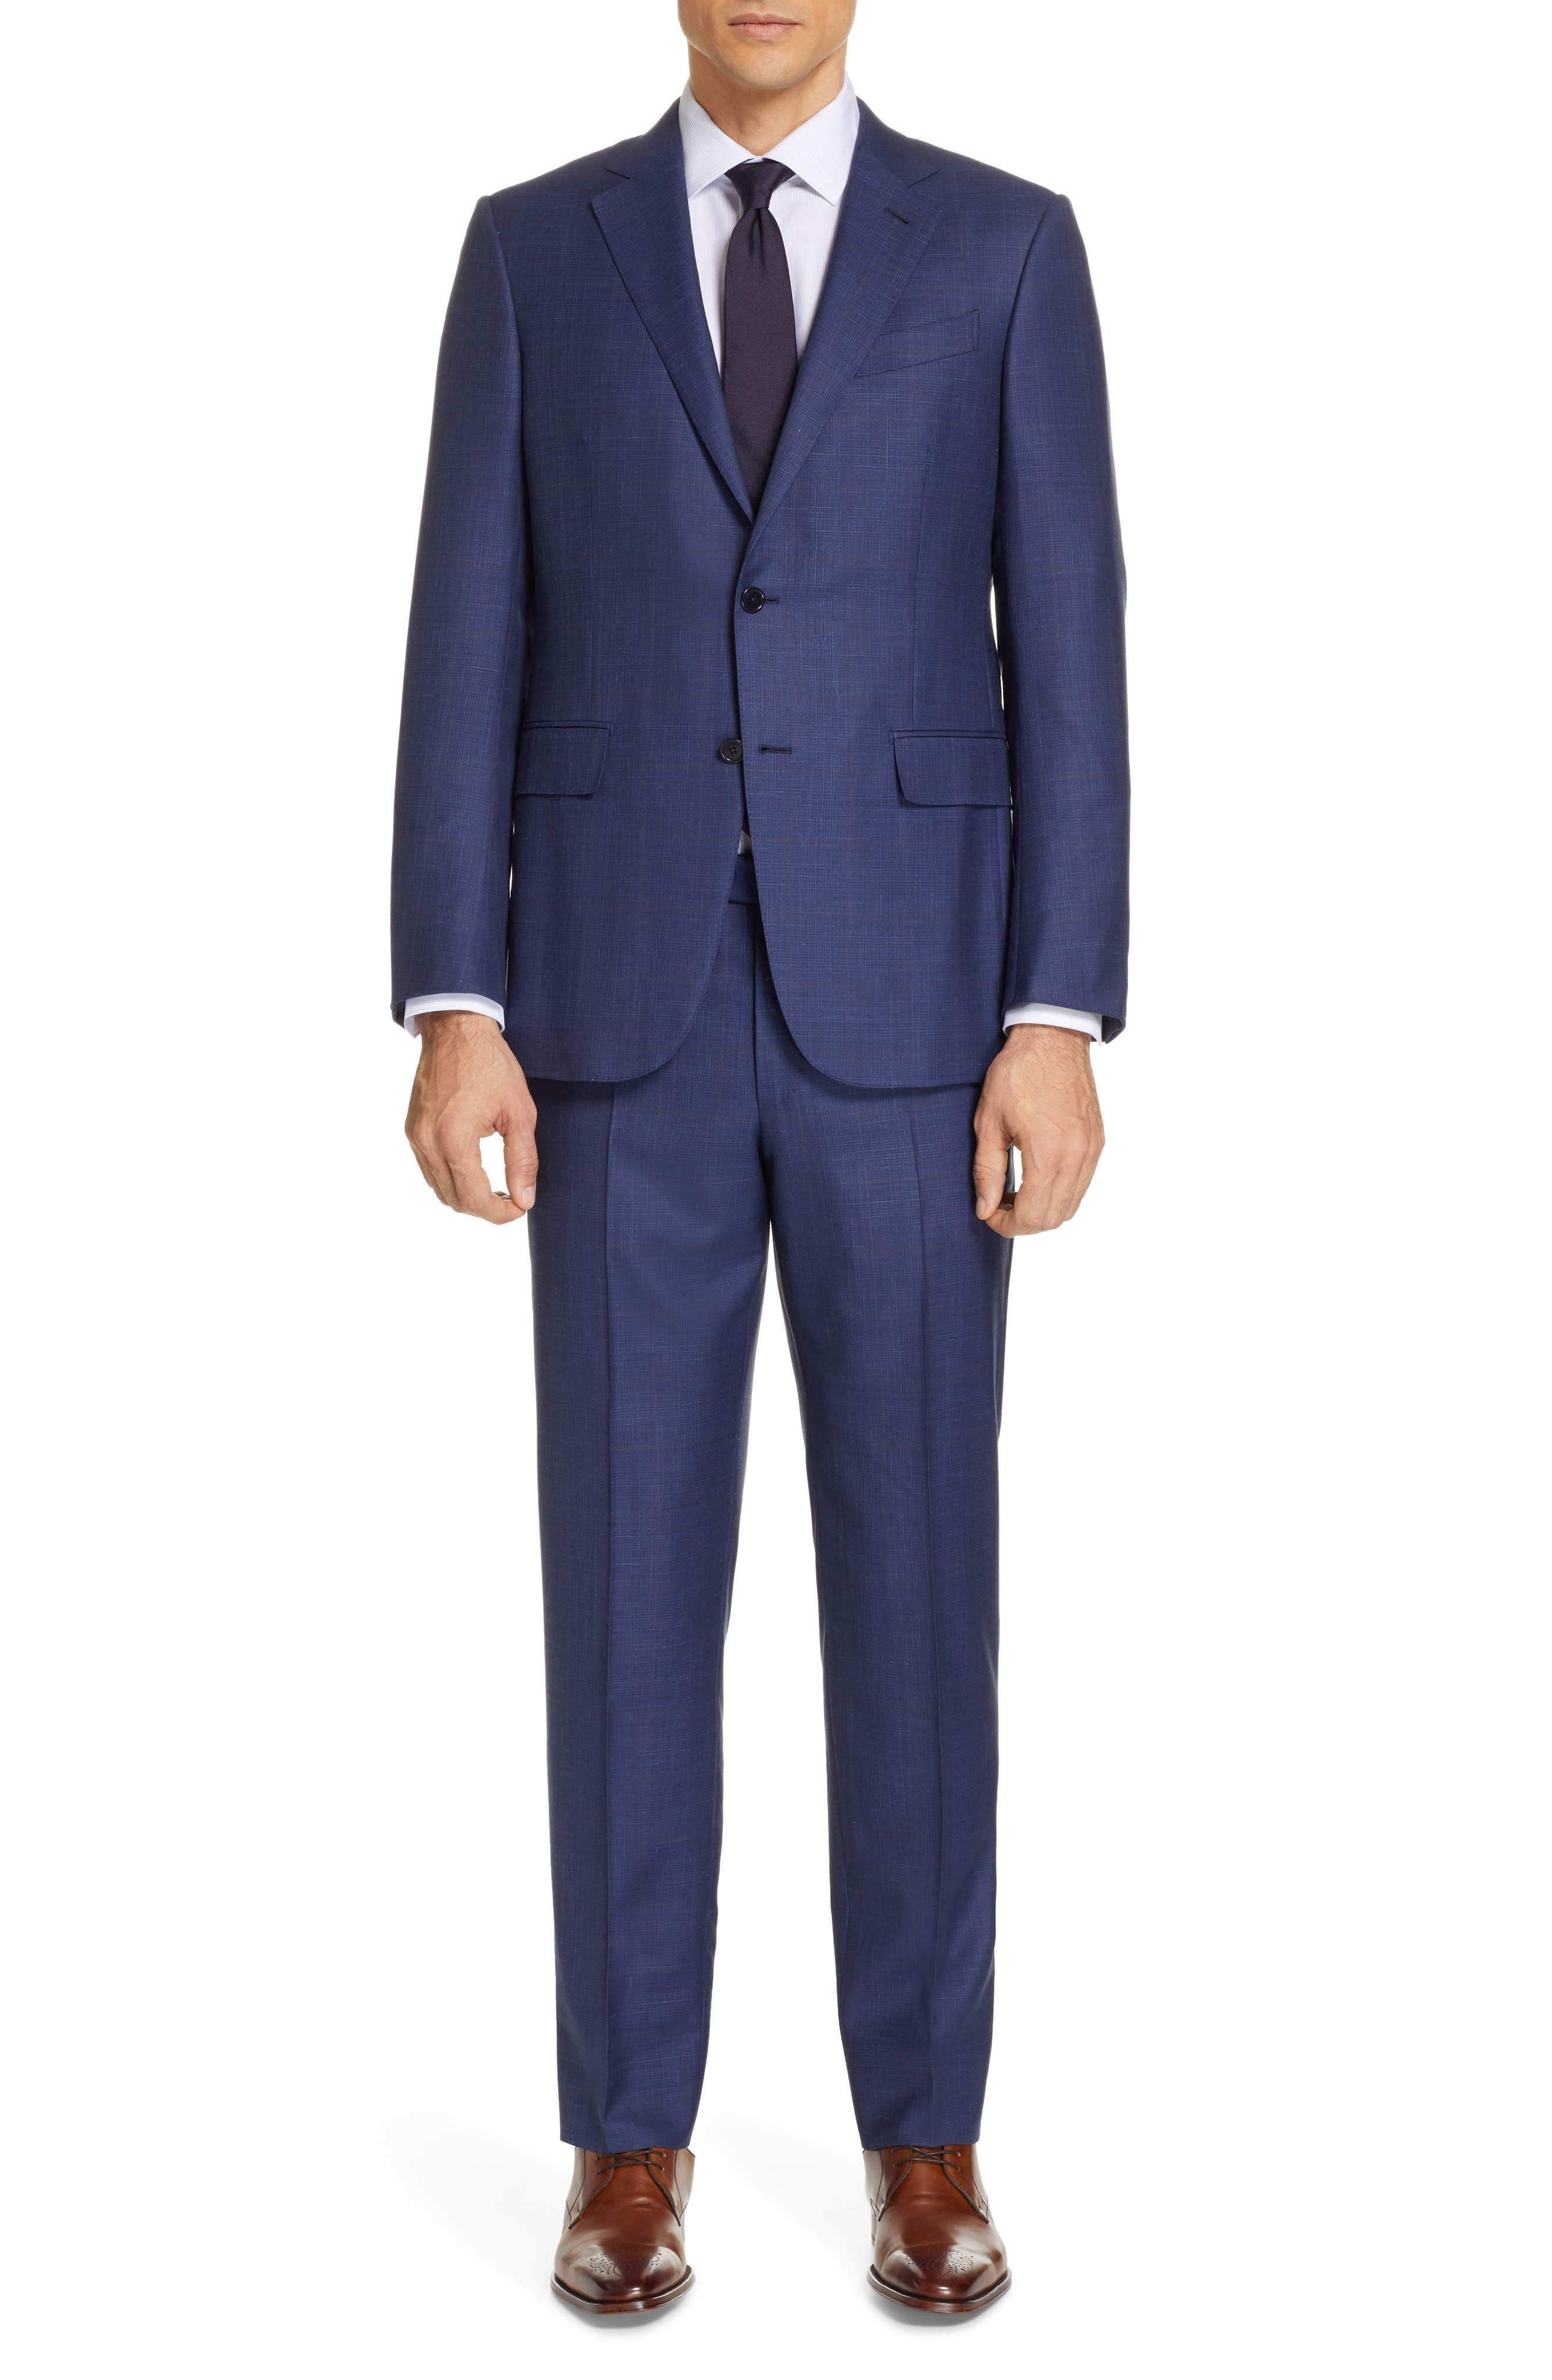 ERMENEGILDO ZEGNA, Trofeo Classic Fit Plaid Wool Blend Suit, Main thumbnail 1, color, TAN